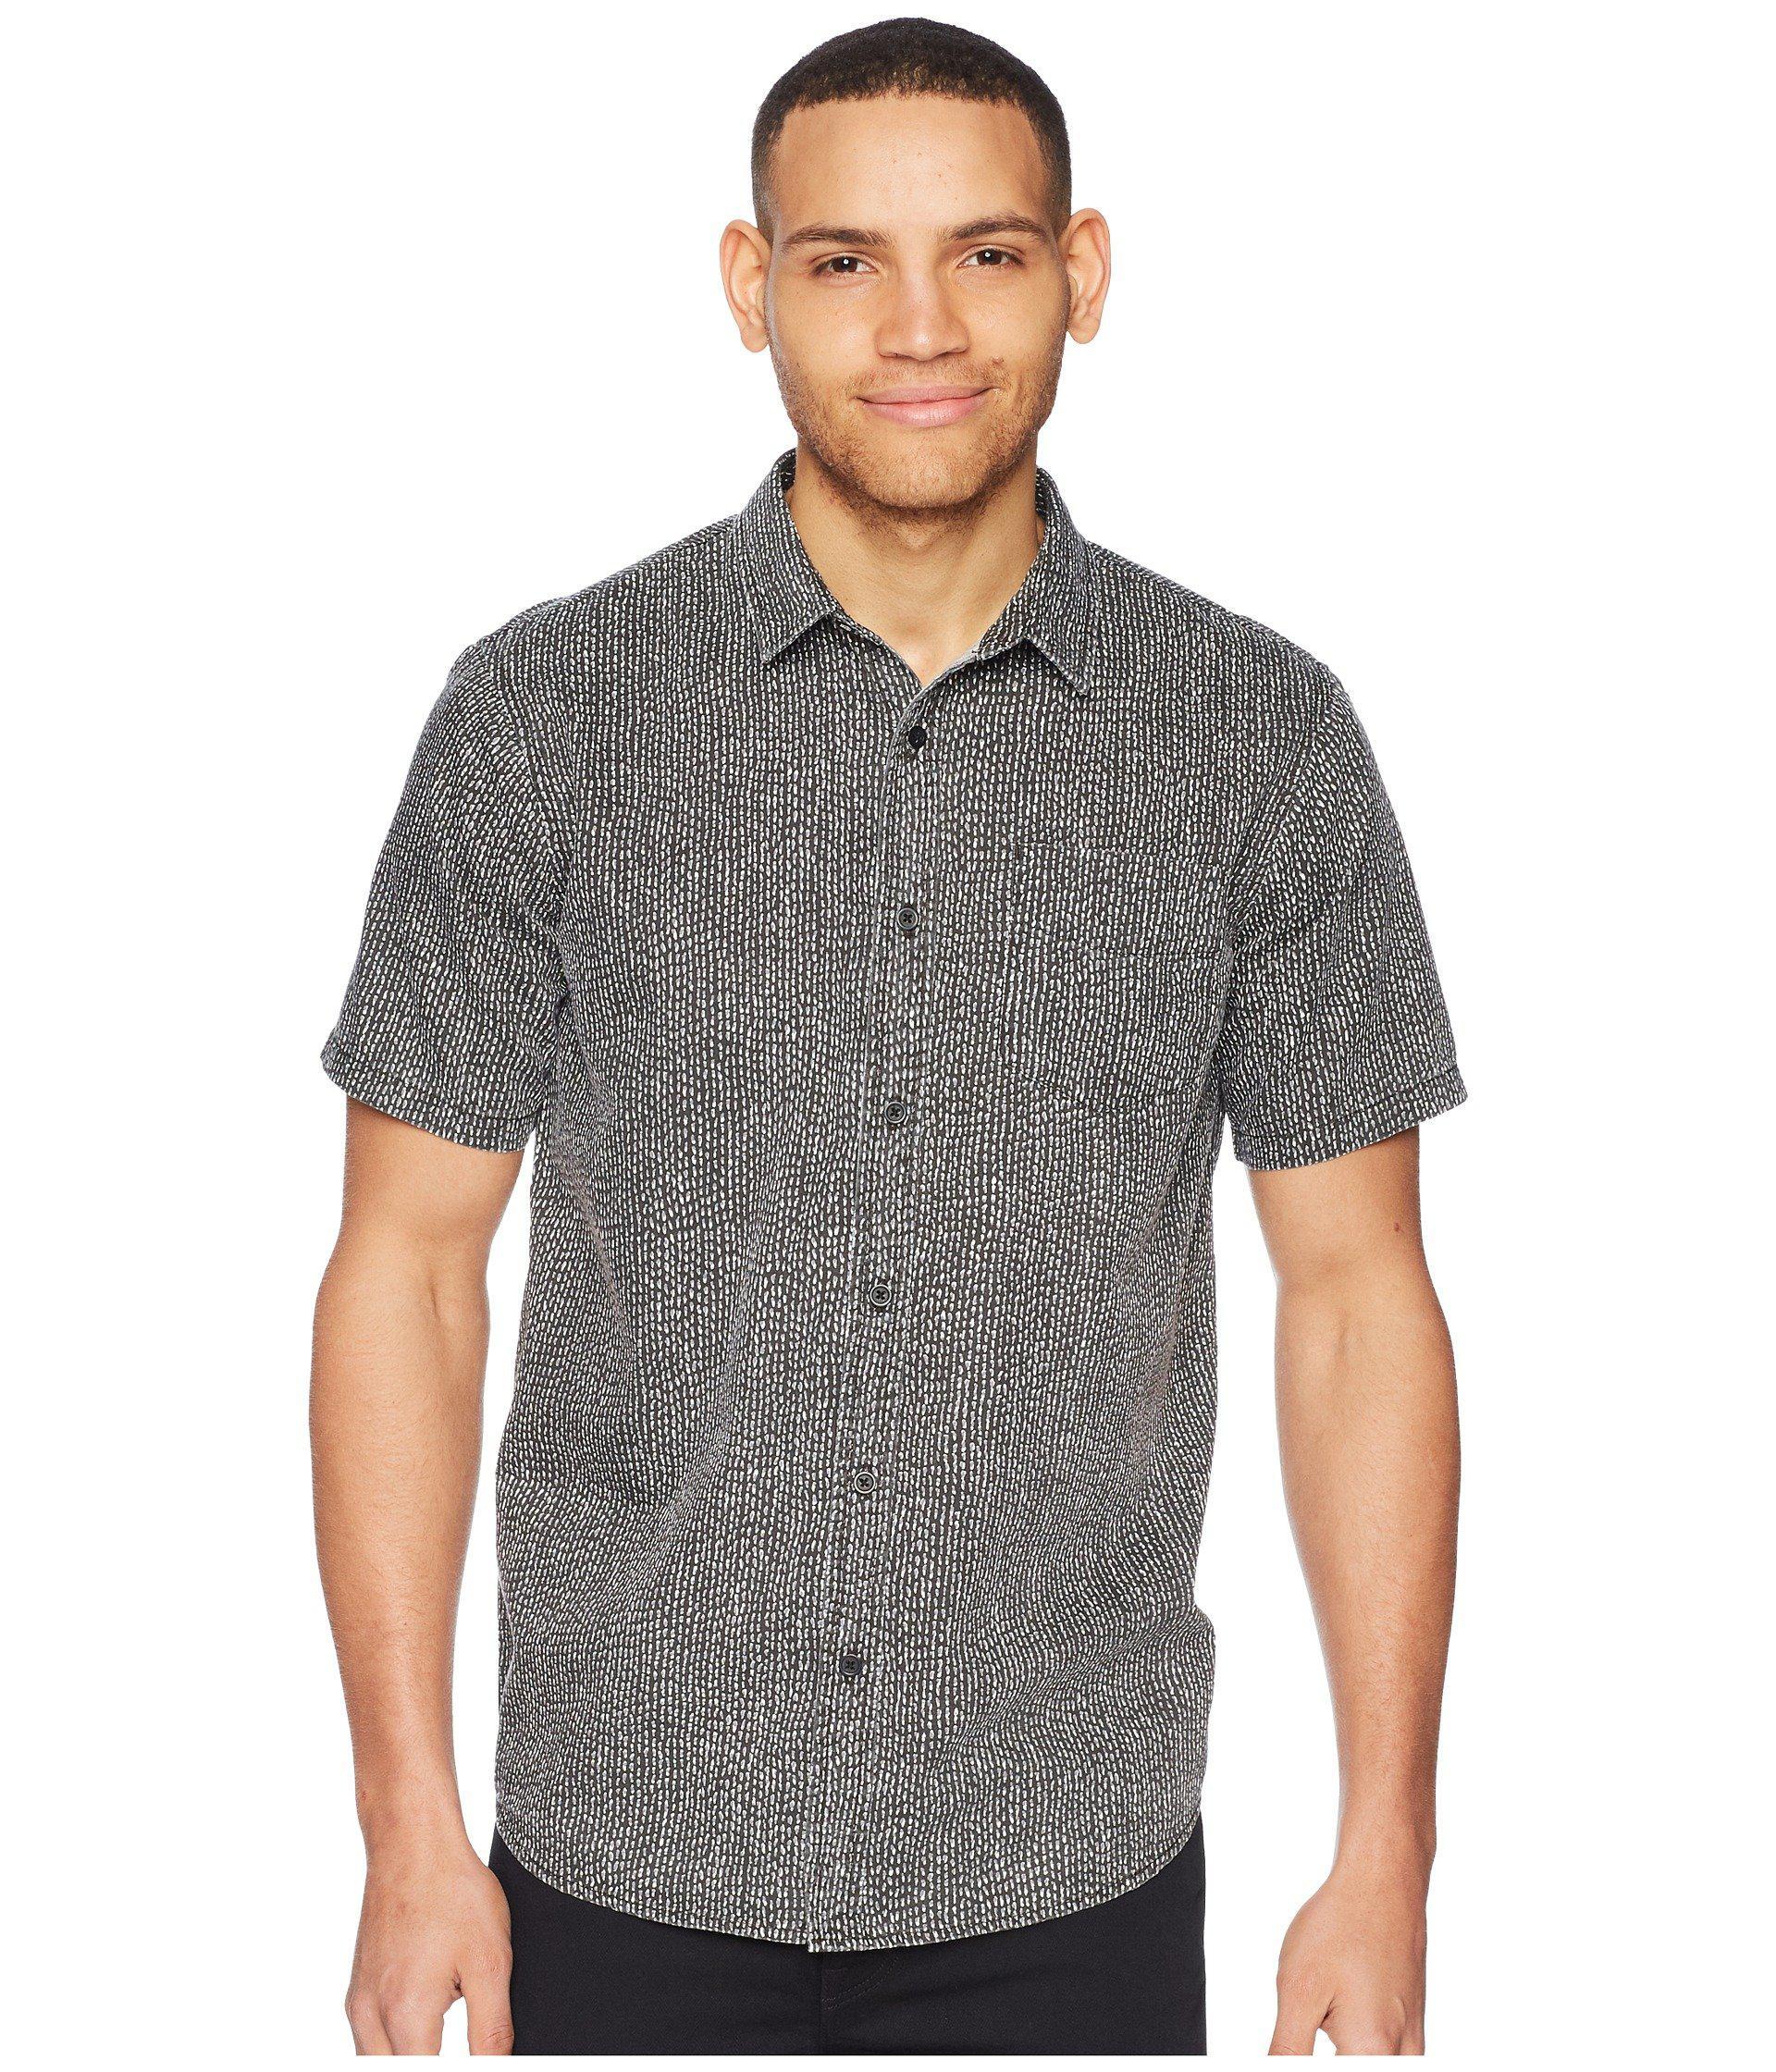 ec18293ff Globe - Black Dash Short Sleeve Shirt for Men - Lyst. View fullscreen